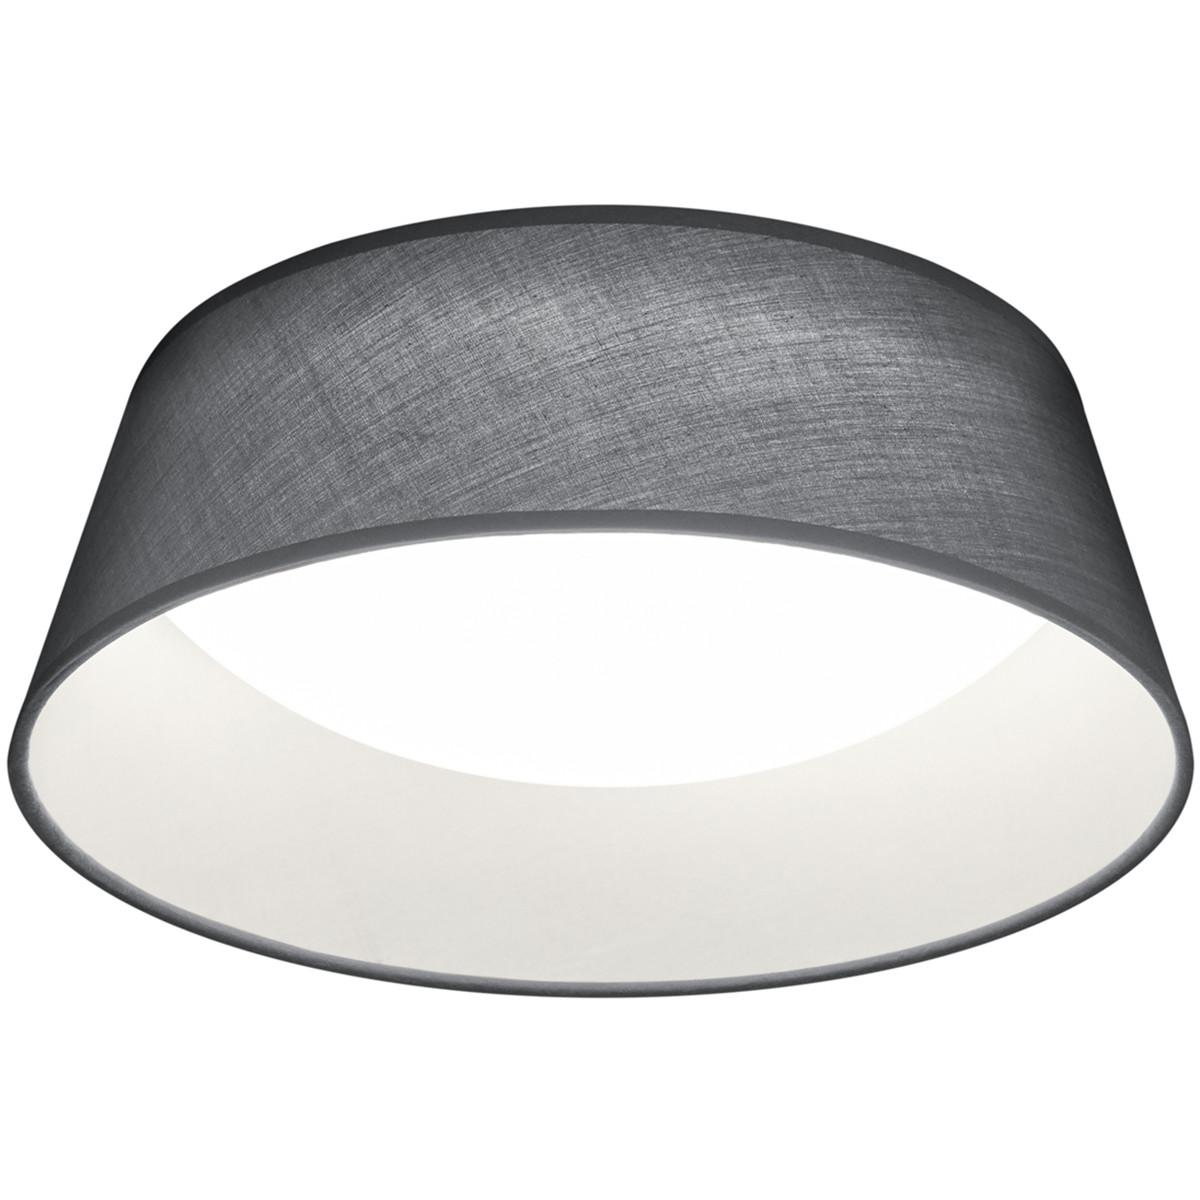 LED Plafondlamp - Plafondverlichting - Trion Pinton - 14W - Warm Wit 3000K - Rond - Mat Grijs - Text